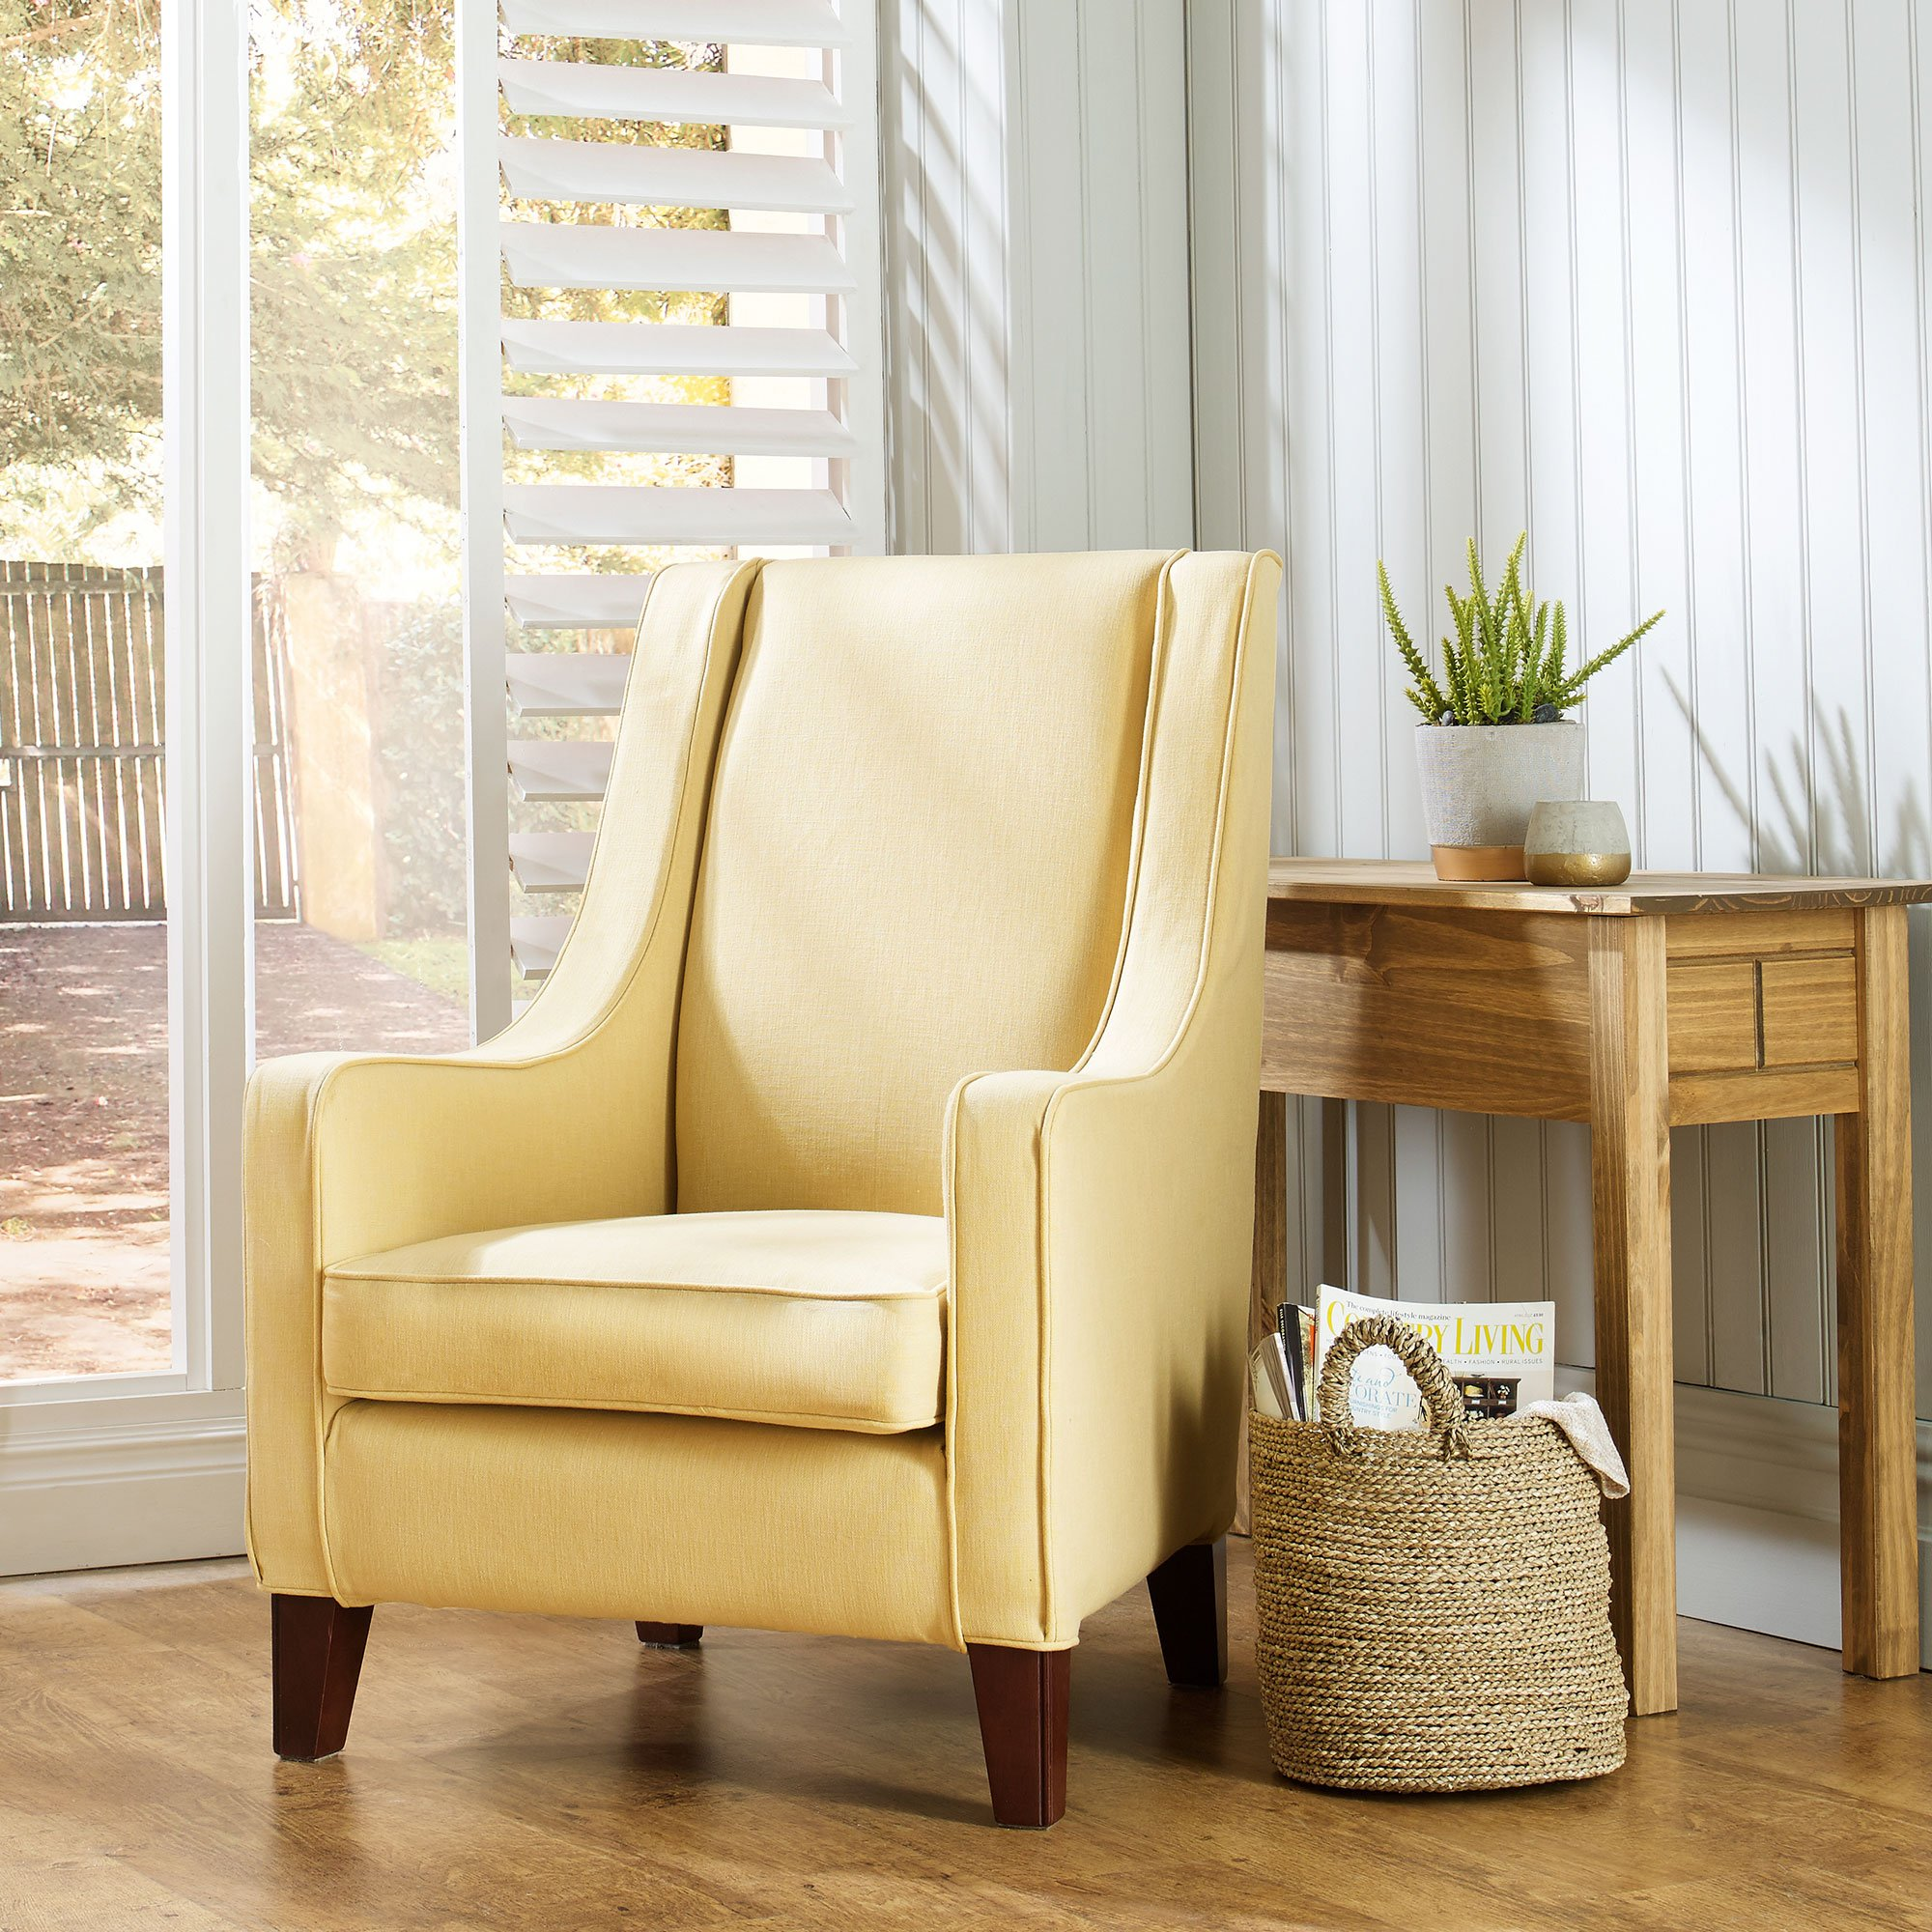 Luxury-Cotton-Weave---Ochre-Image1